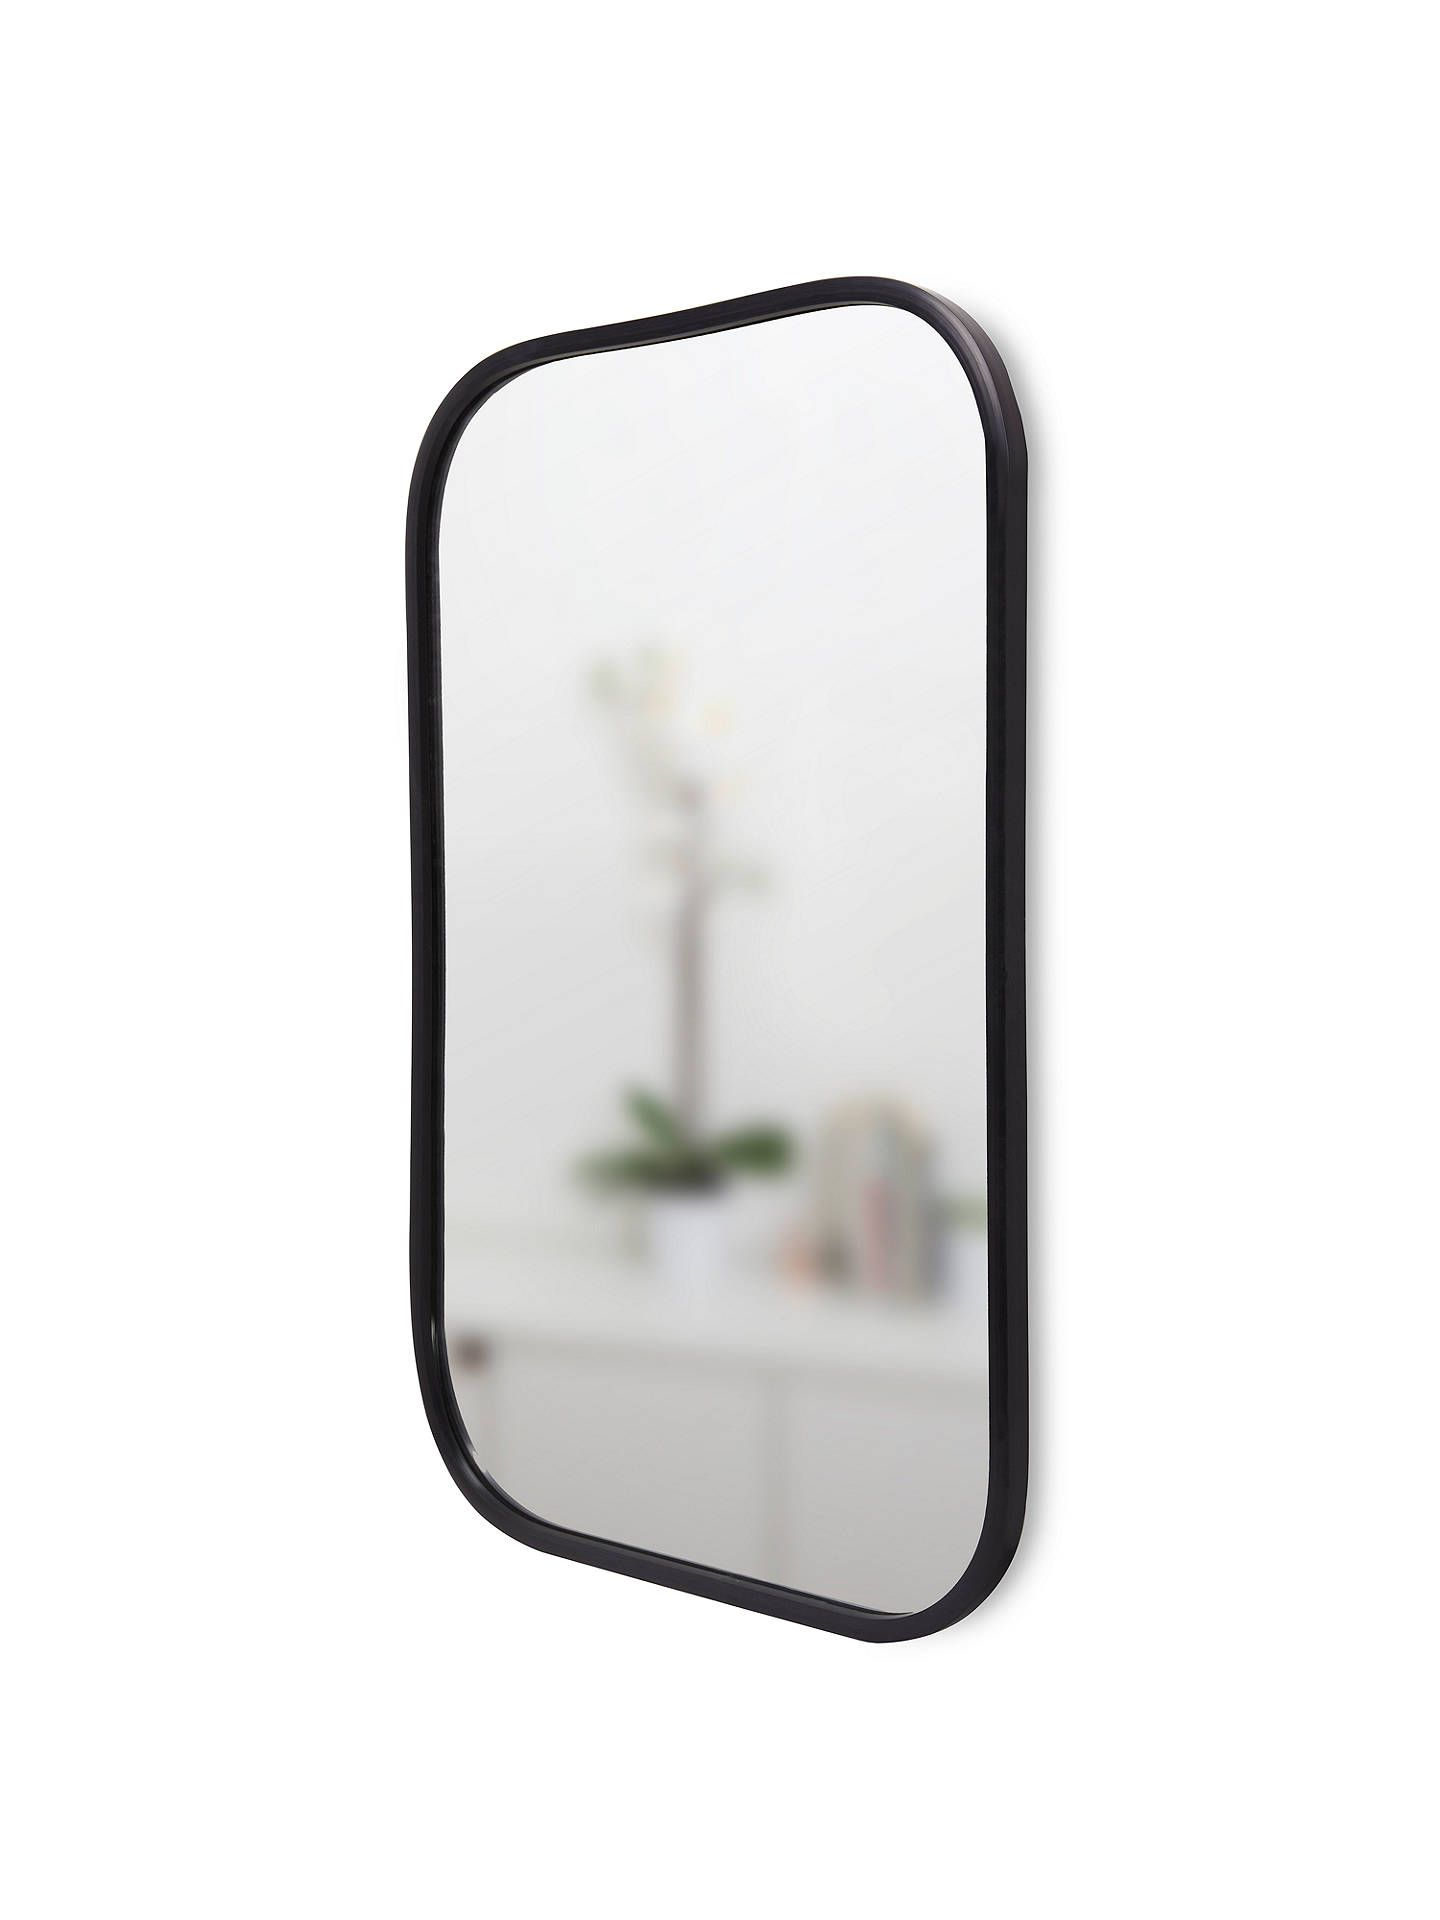 Umbra Rounded Corners Mirror H93cm Black Corner Mirror Mirror Round Corner